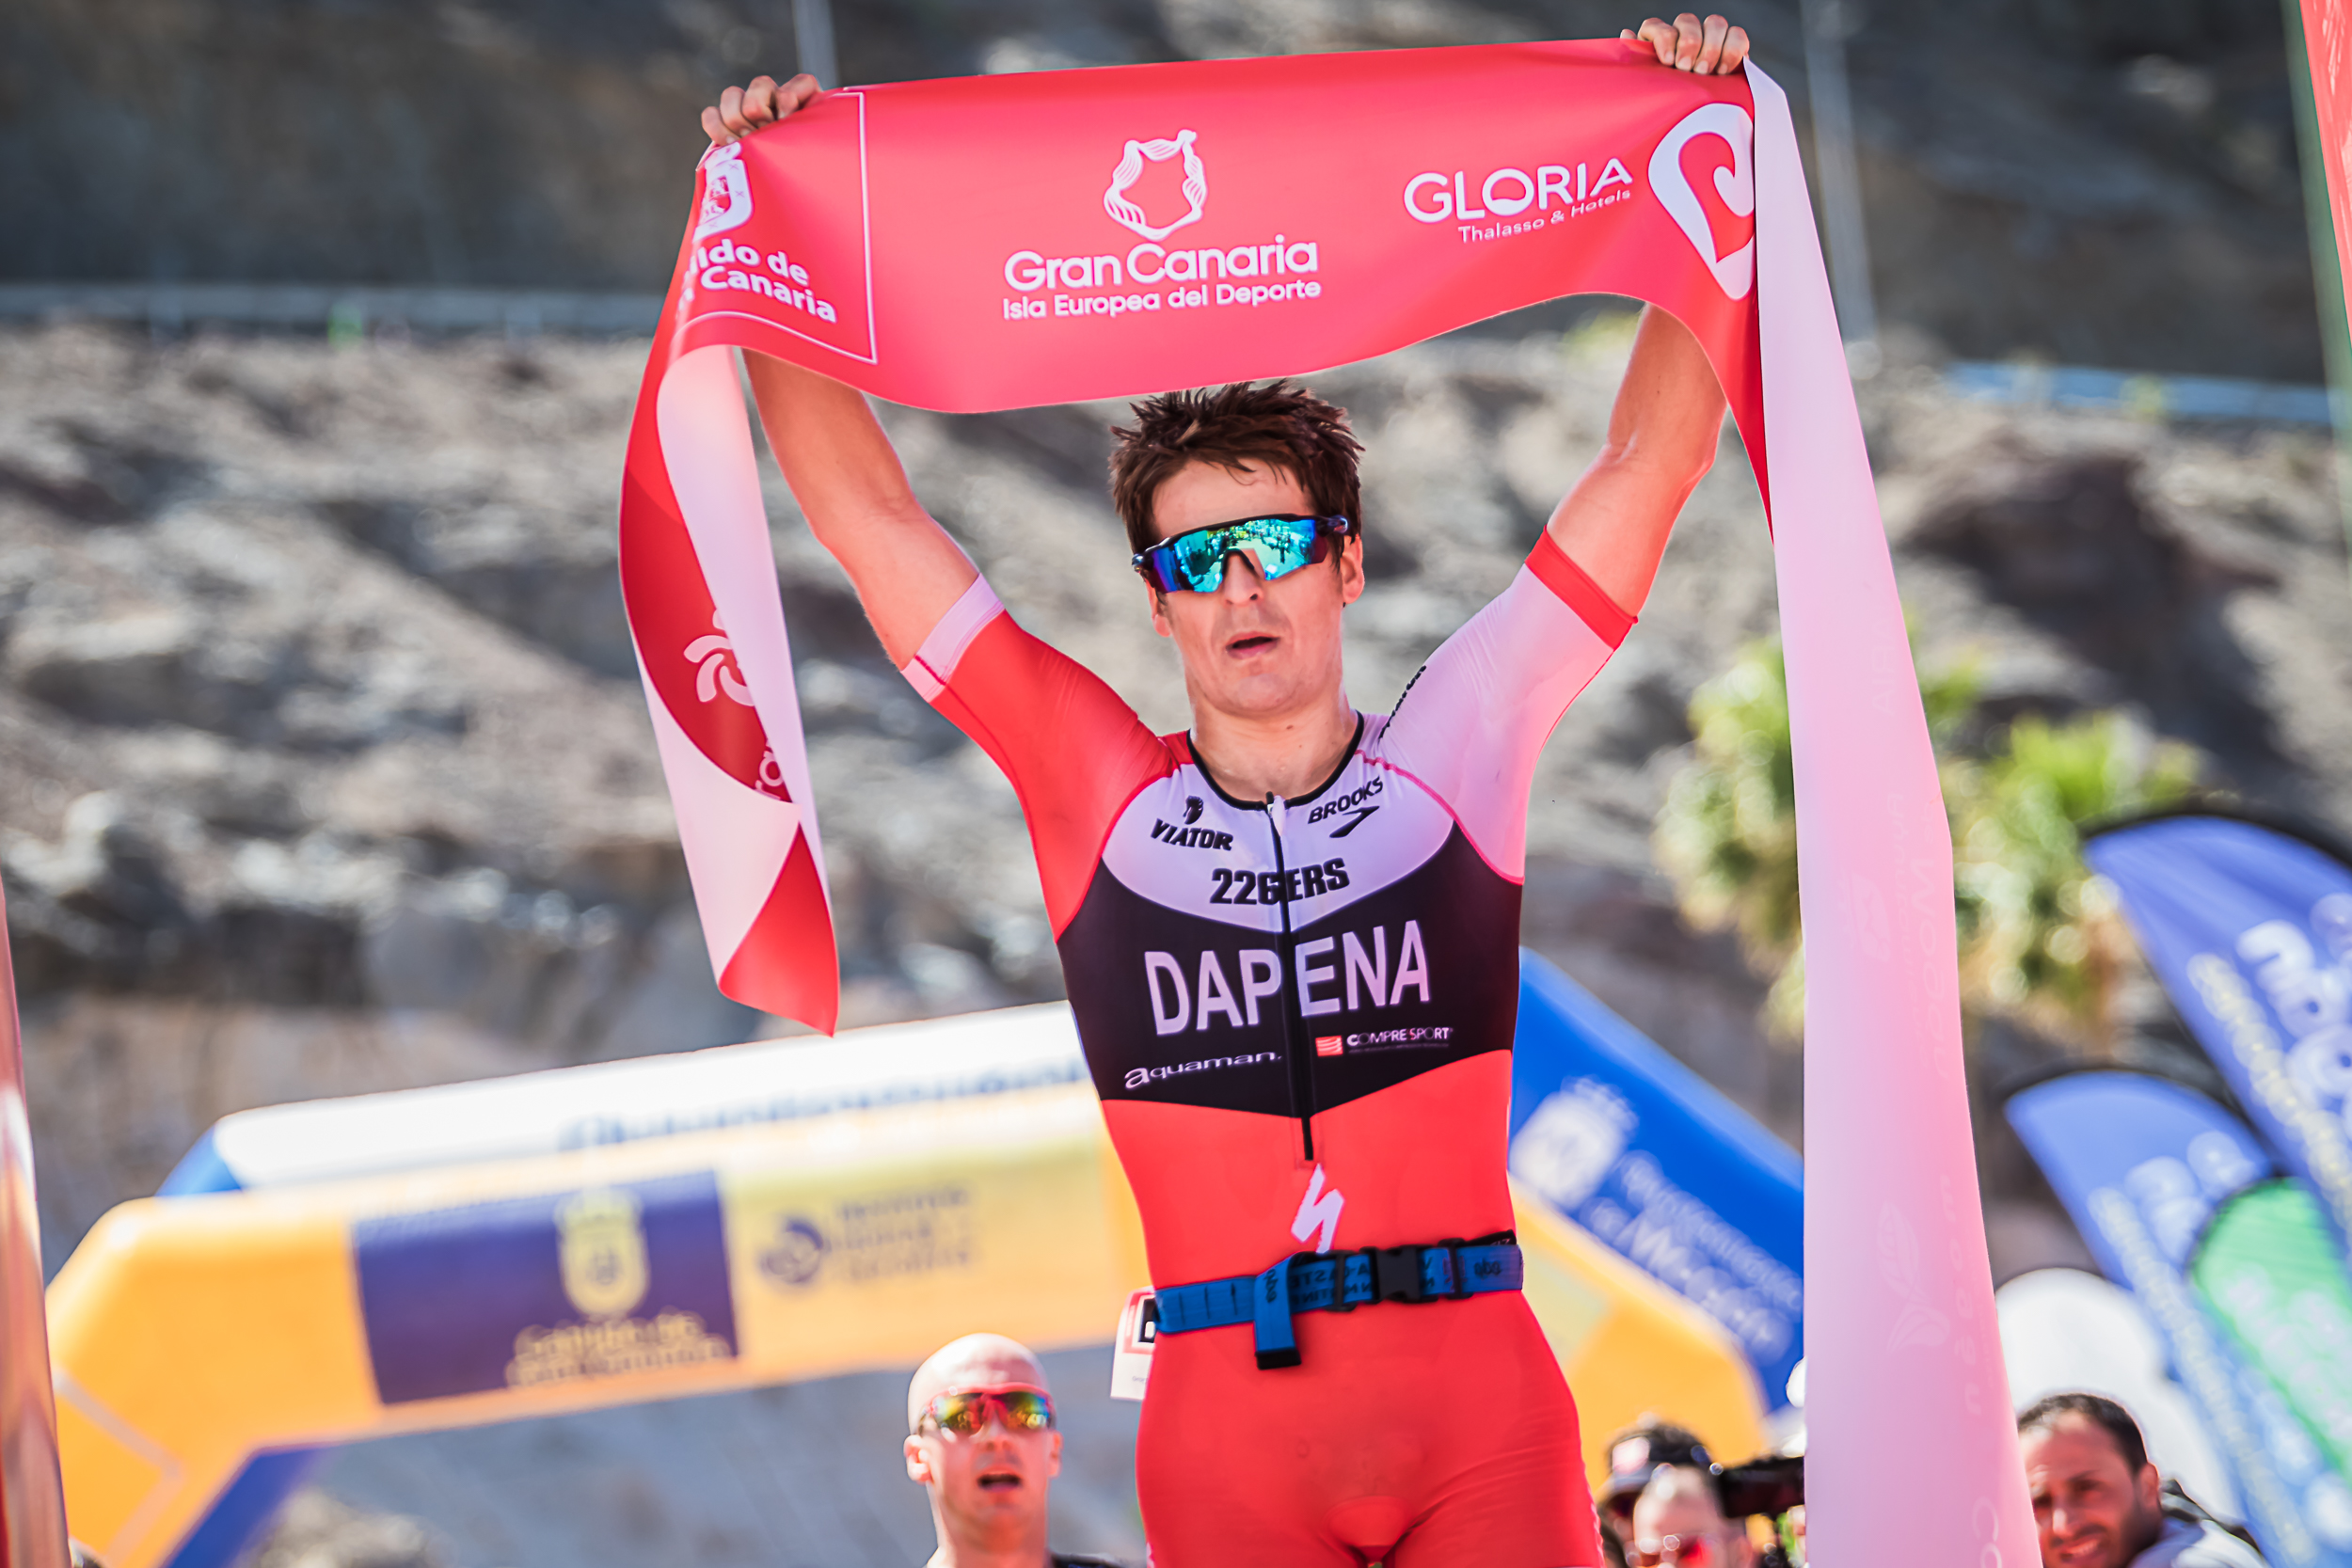 Pablo Dapena e Yvonne Van Vlerken se alzan como ganadores de Gloria Challenge Mogán Gran Canaria 2018